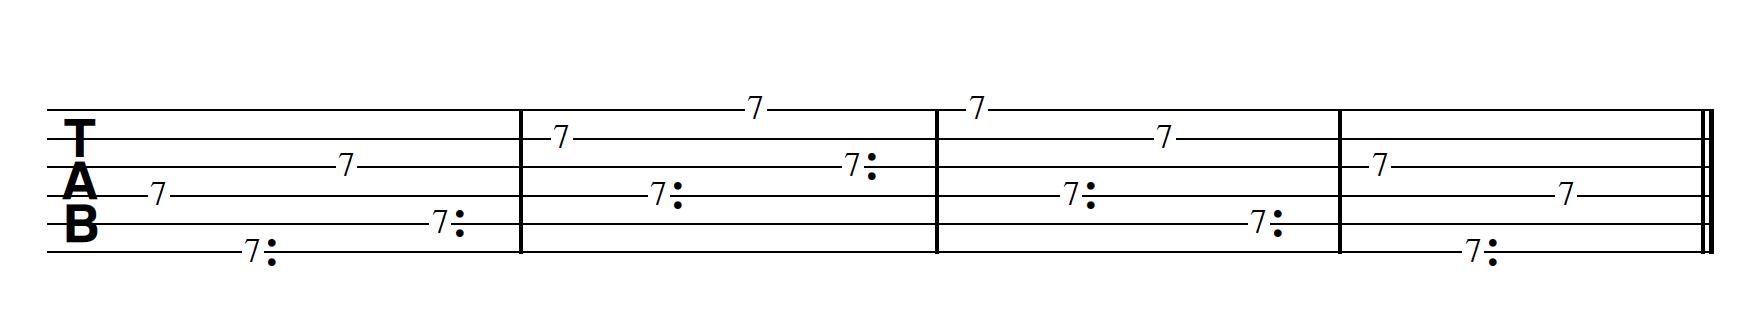 Harp Harmonic Pattern Regular Note First Bm7/11